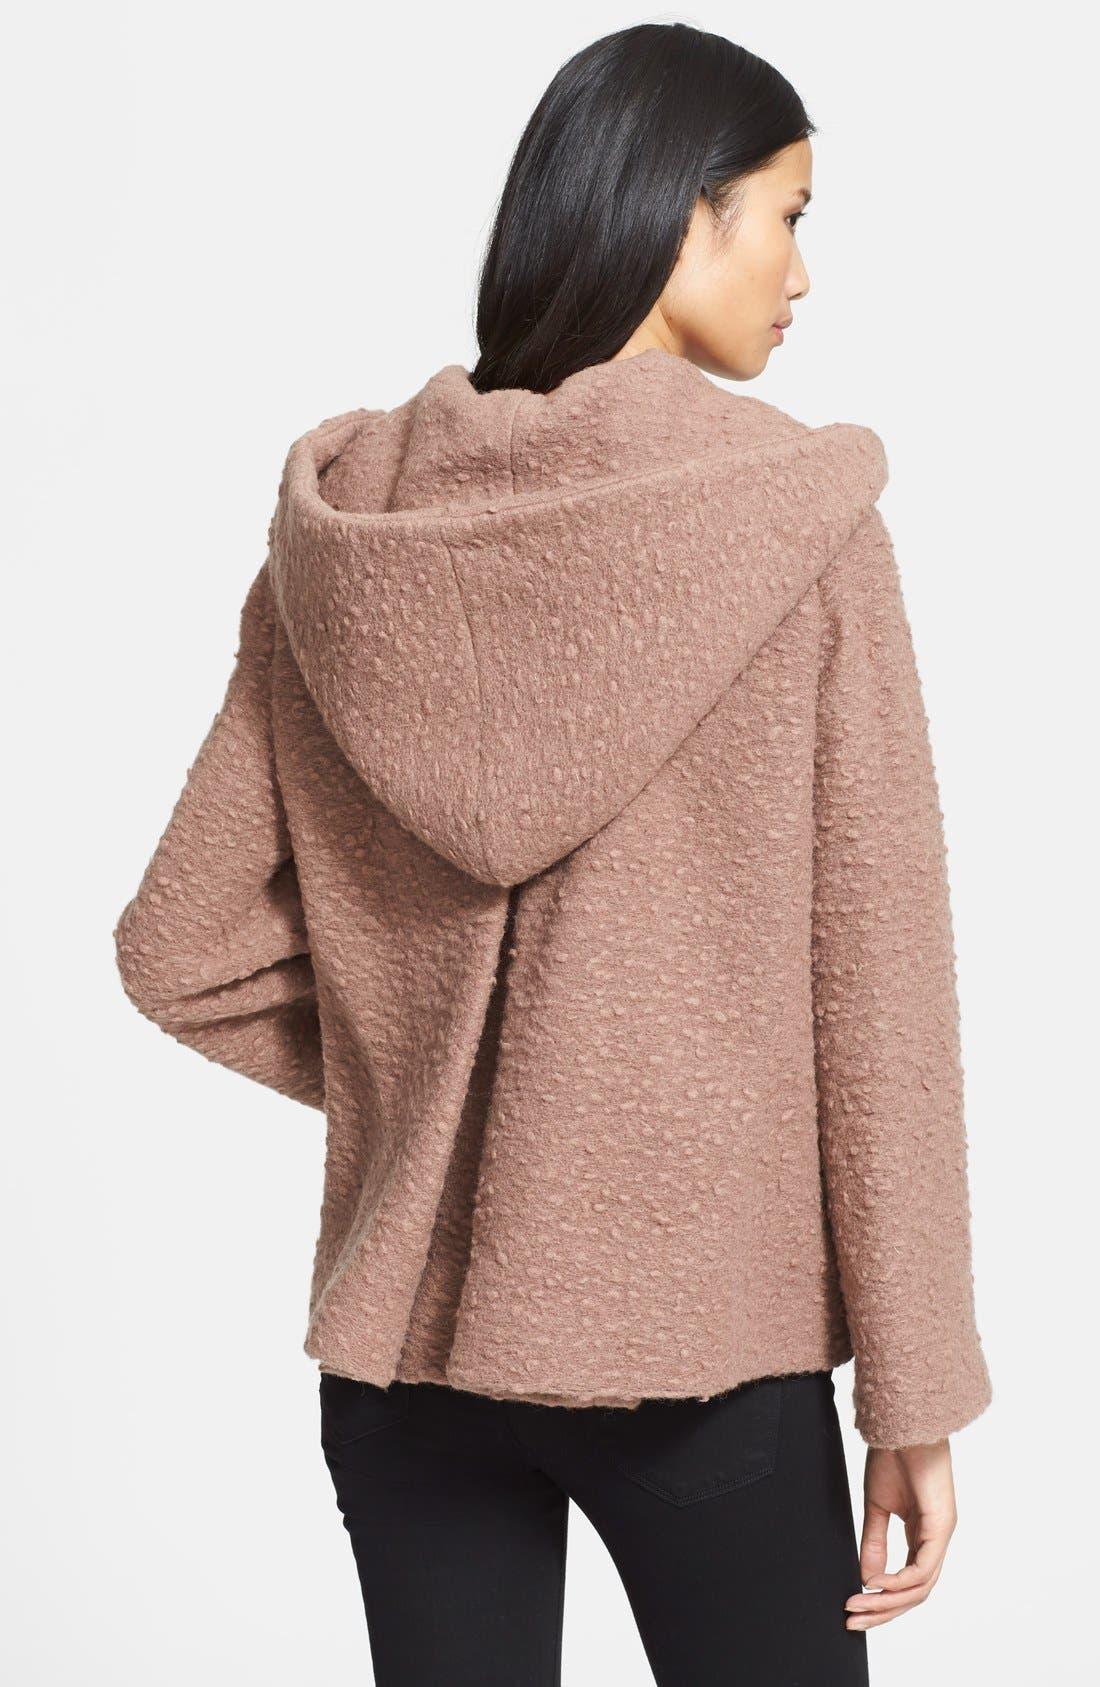 JILL STUART,                             'Diane' Wool Blend Short Coat,                             Alternate thumbnail 3, color,                             020